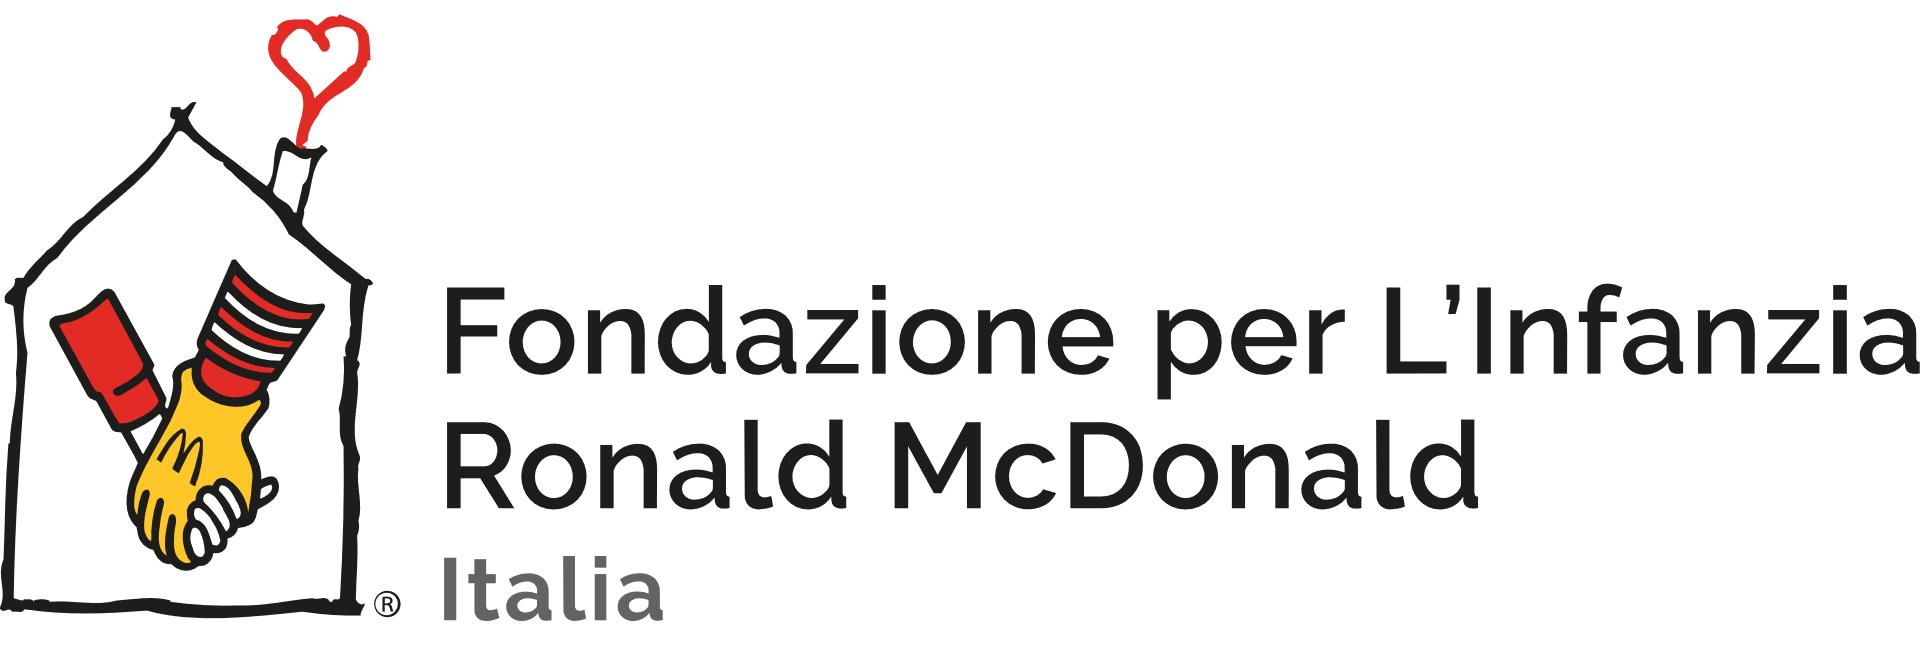 https://www.rugbyitalianclassicxv.com/wp-content/uploads/2020/02/Logo_Fondazione_Ronald_McDonald-e1581869898565.png